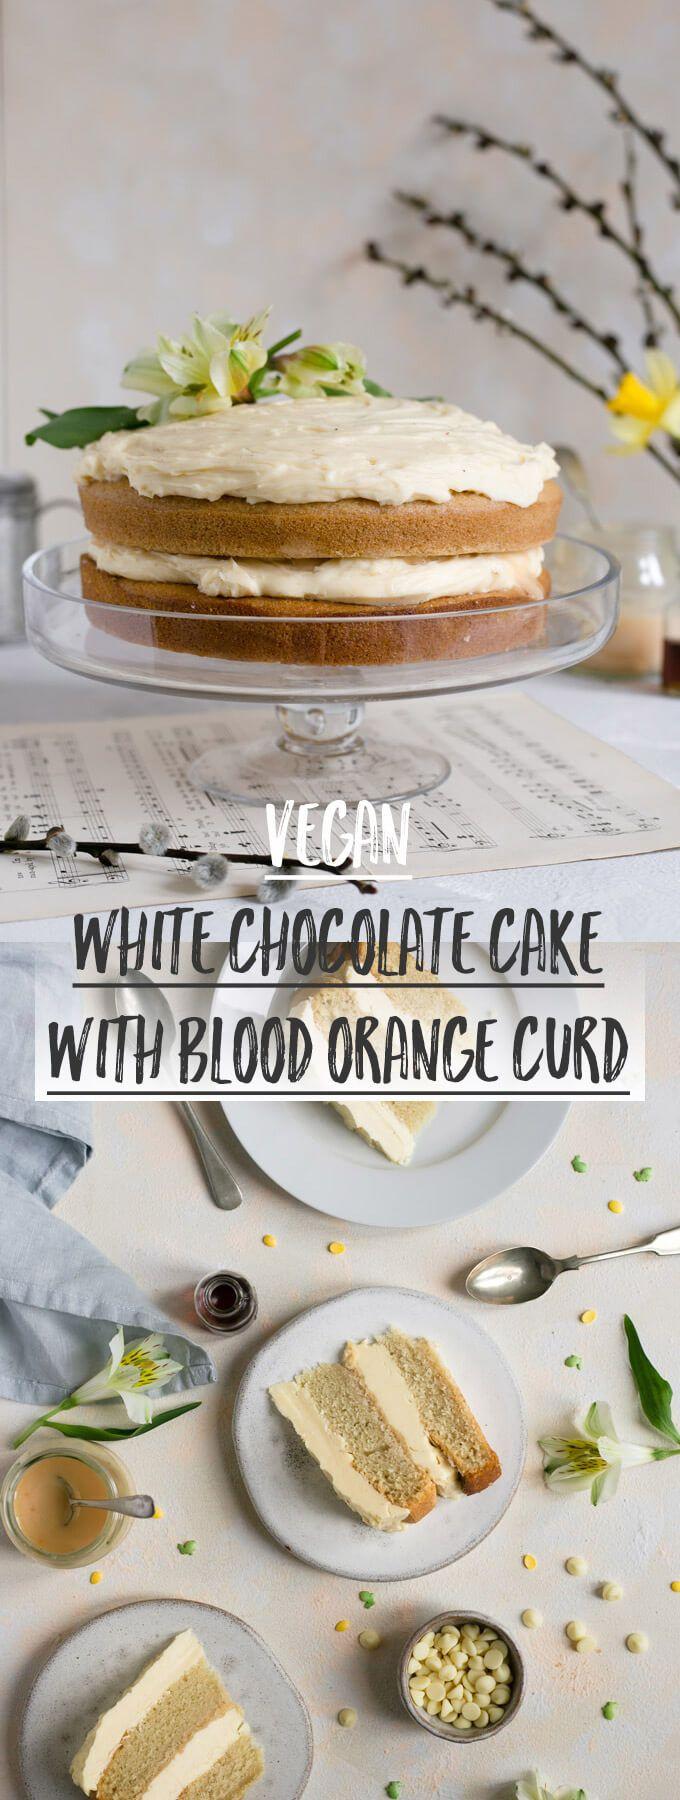 Vegan white chocolate cake with a hidden layer of blood orange curd #vegan #dairyfree #cake   via @annabanana.co